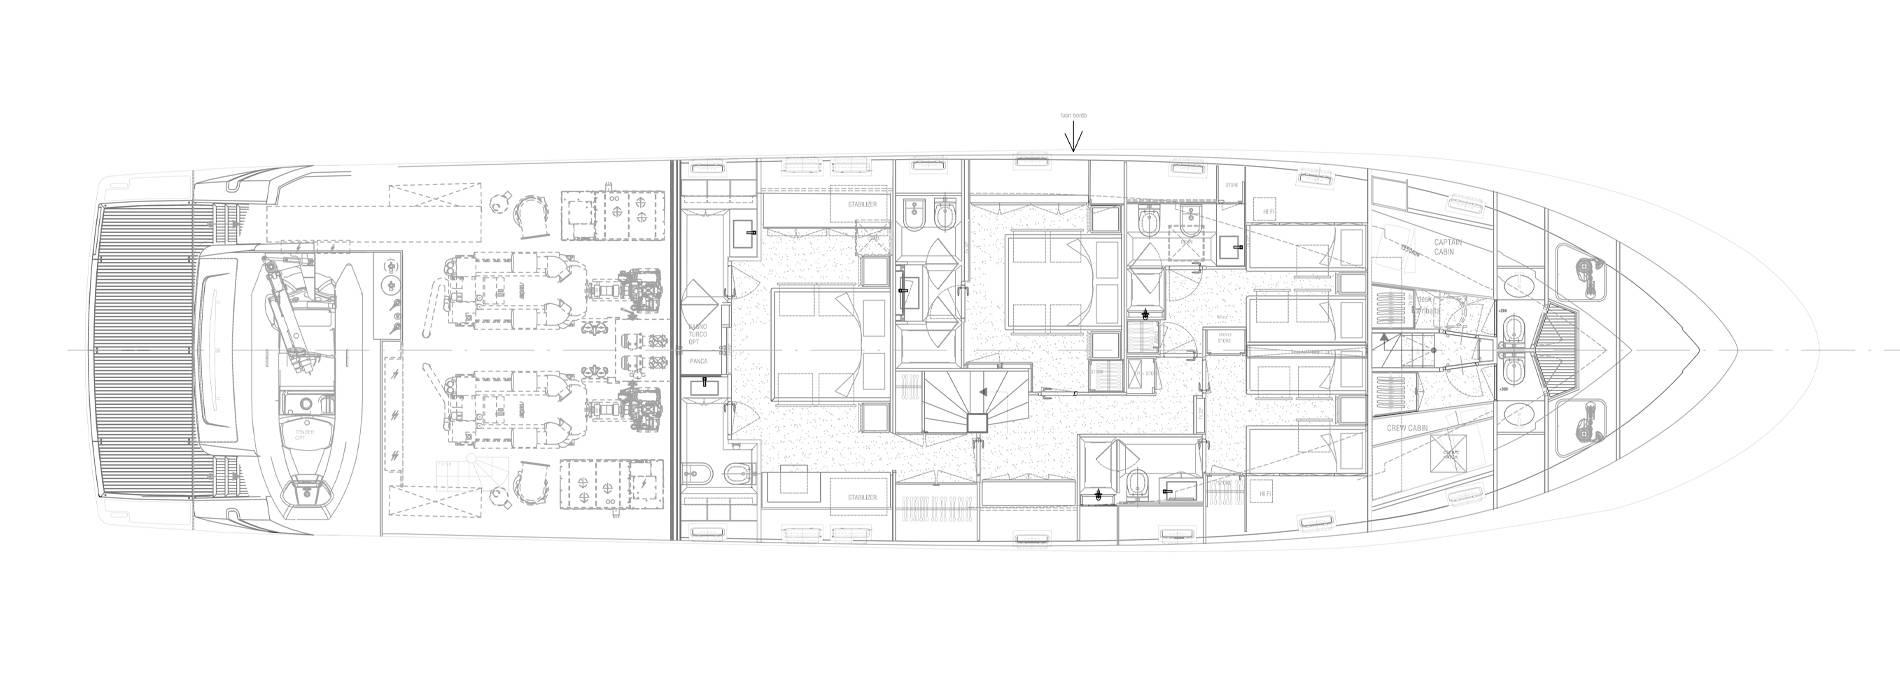 Sanlorenzo Yachts SL96-631 Нижняя палуба